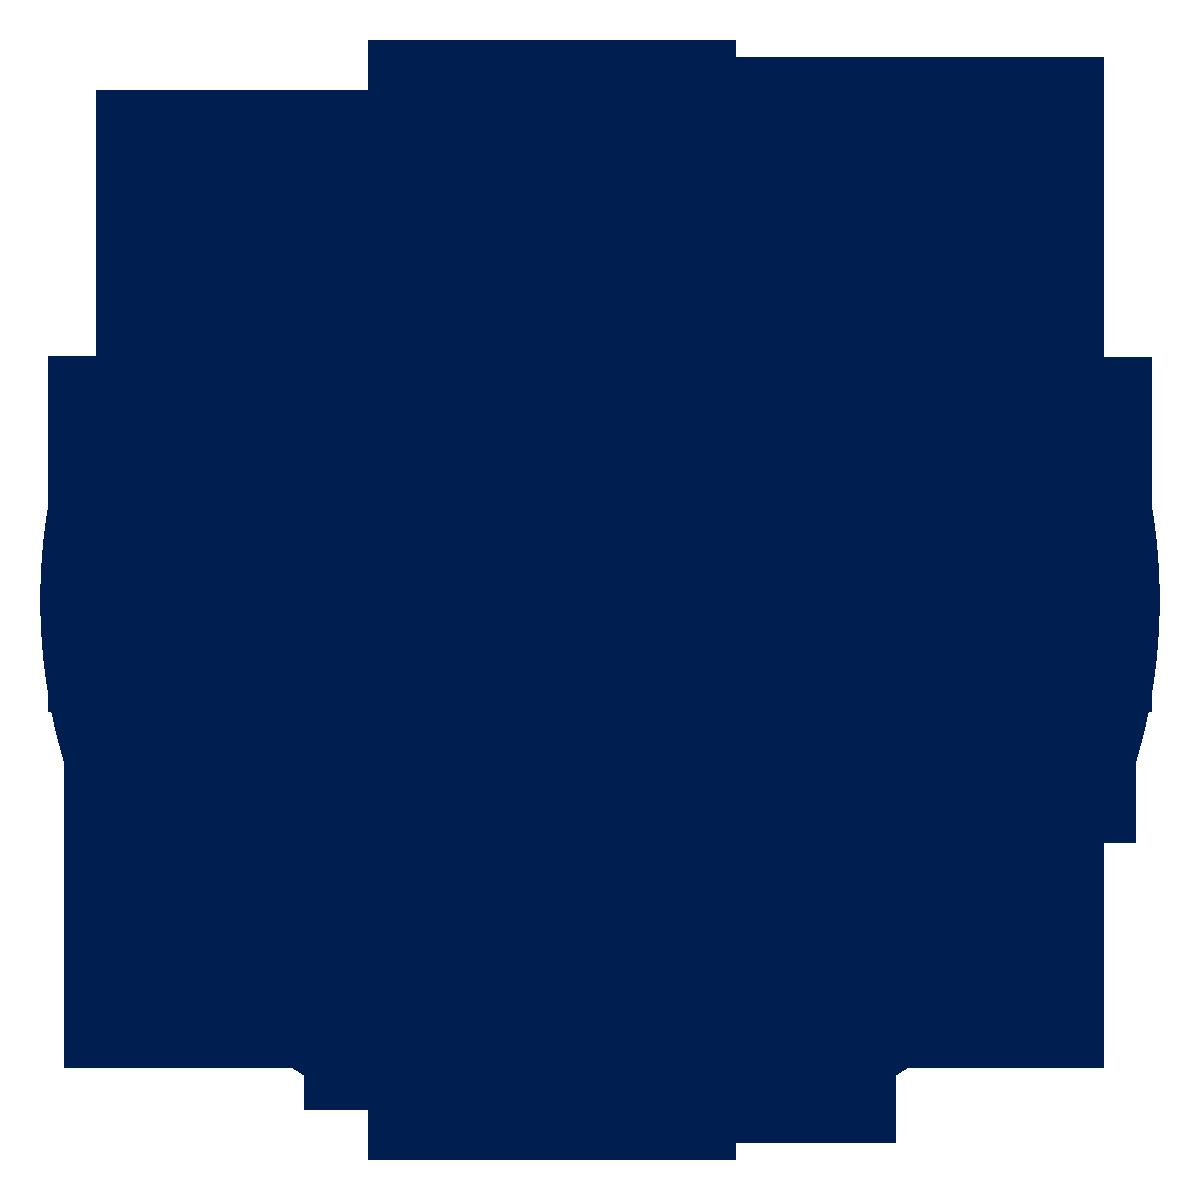 volkswagen-patrignani-orvieto